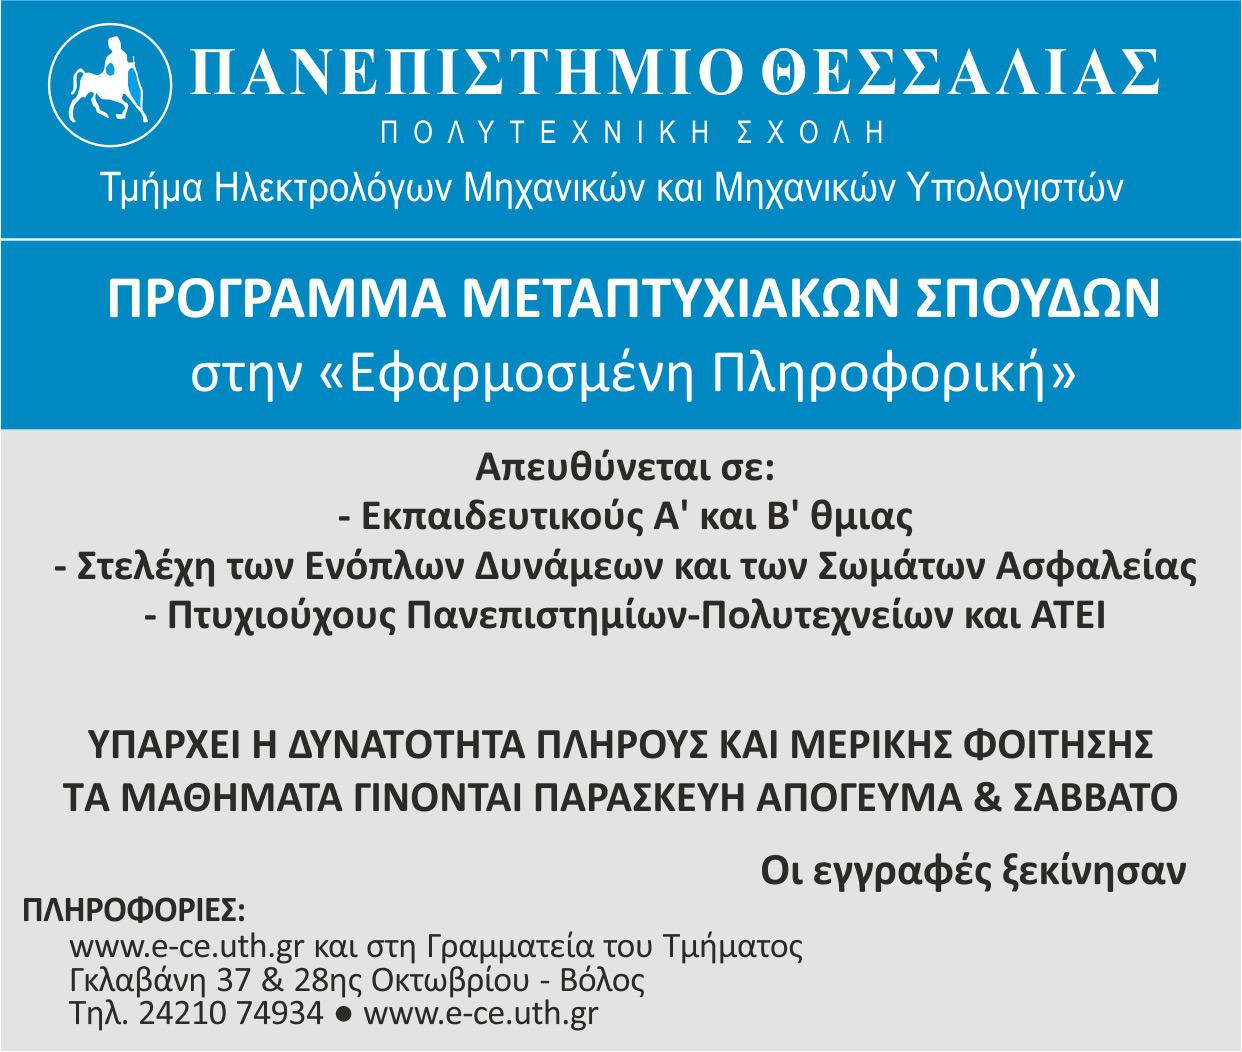 http://taxydromos.gr/data/foto/1463415665481787441.pdf